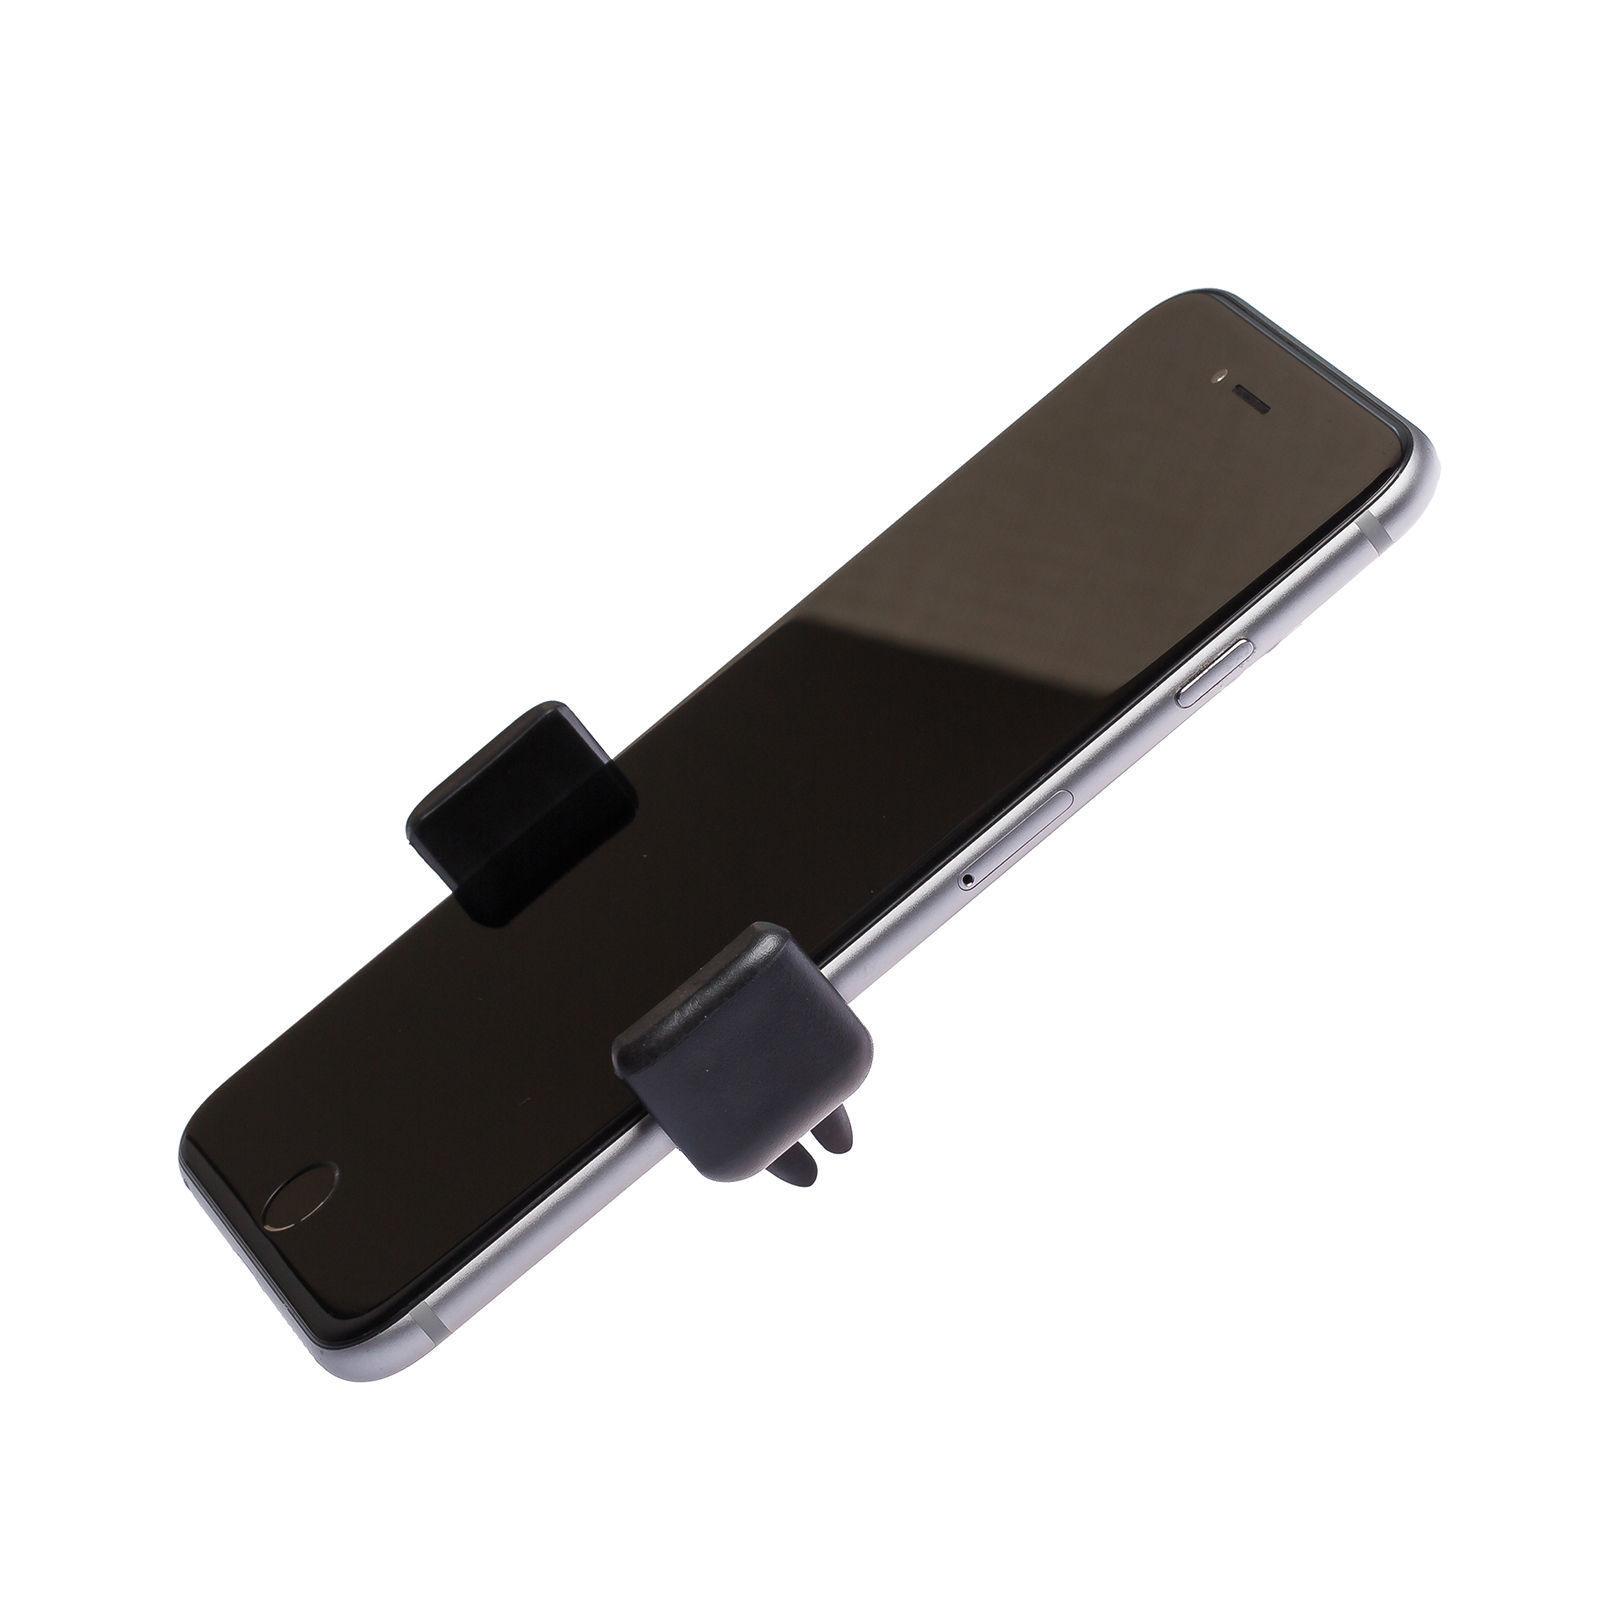 handy halterung l ftungsgitter iphone samsung kfz. Black Bedroom Furniture Sets. Home Design Ideas